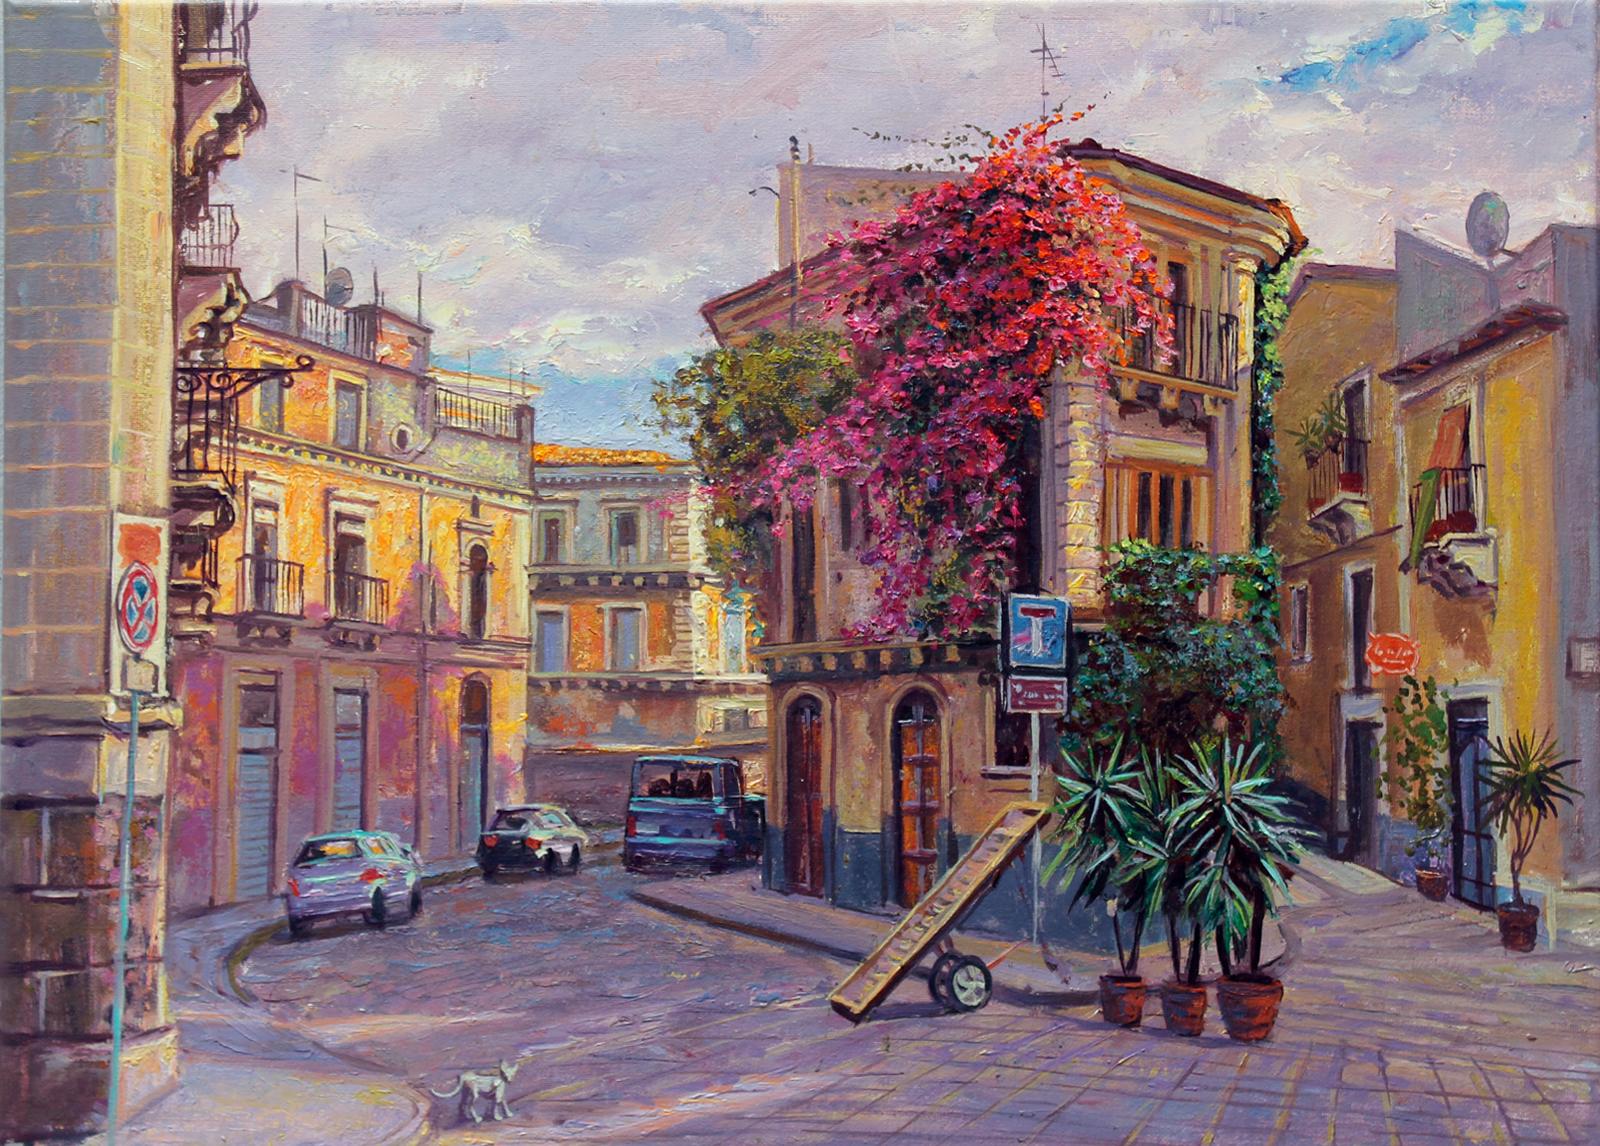 Palazzu Stidda, Catania